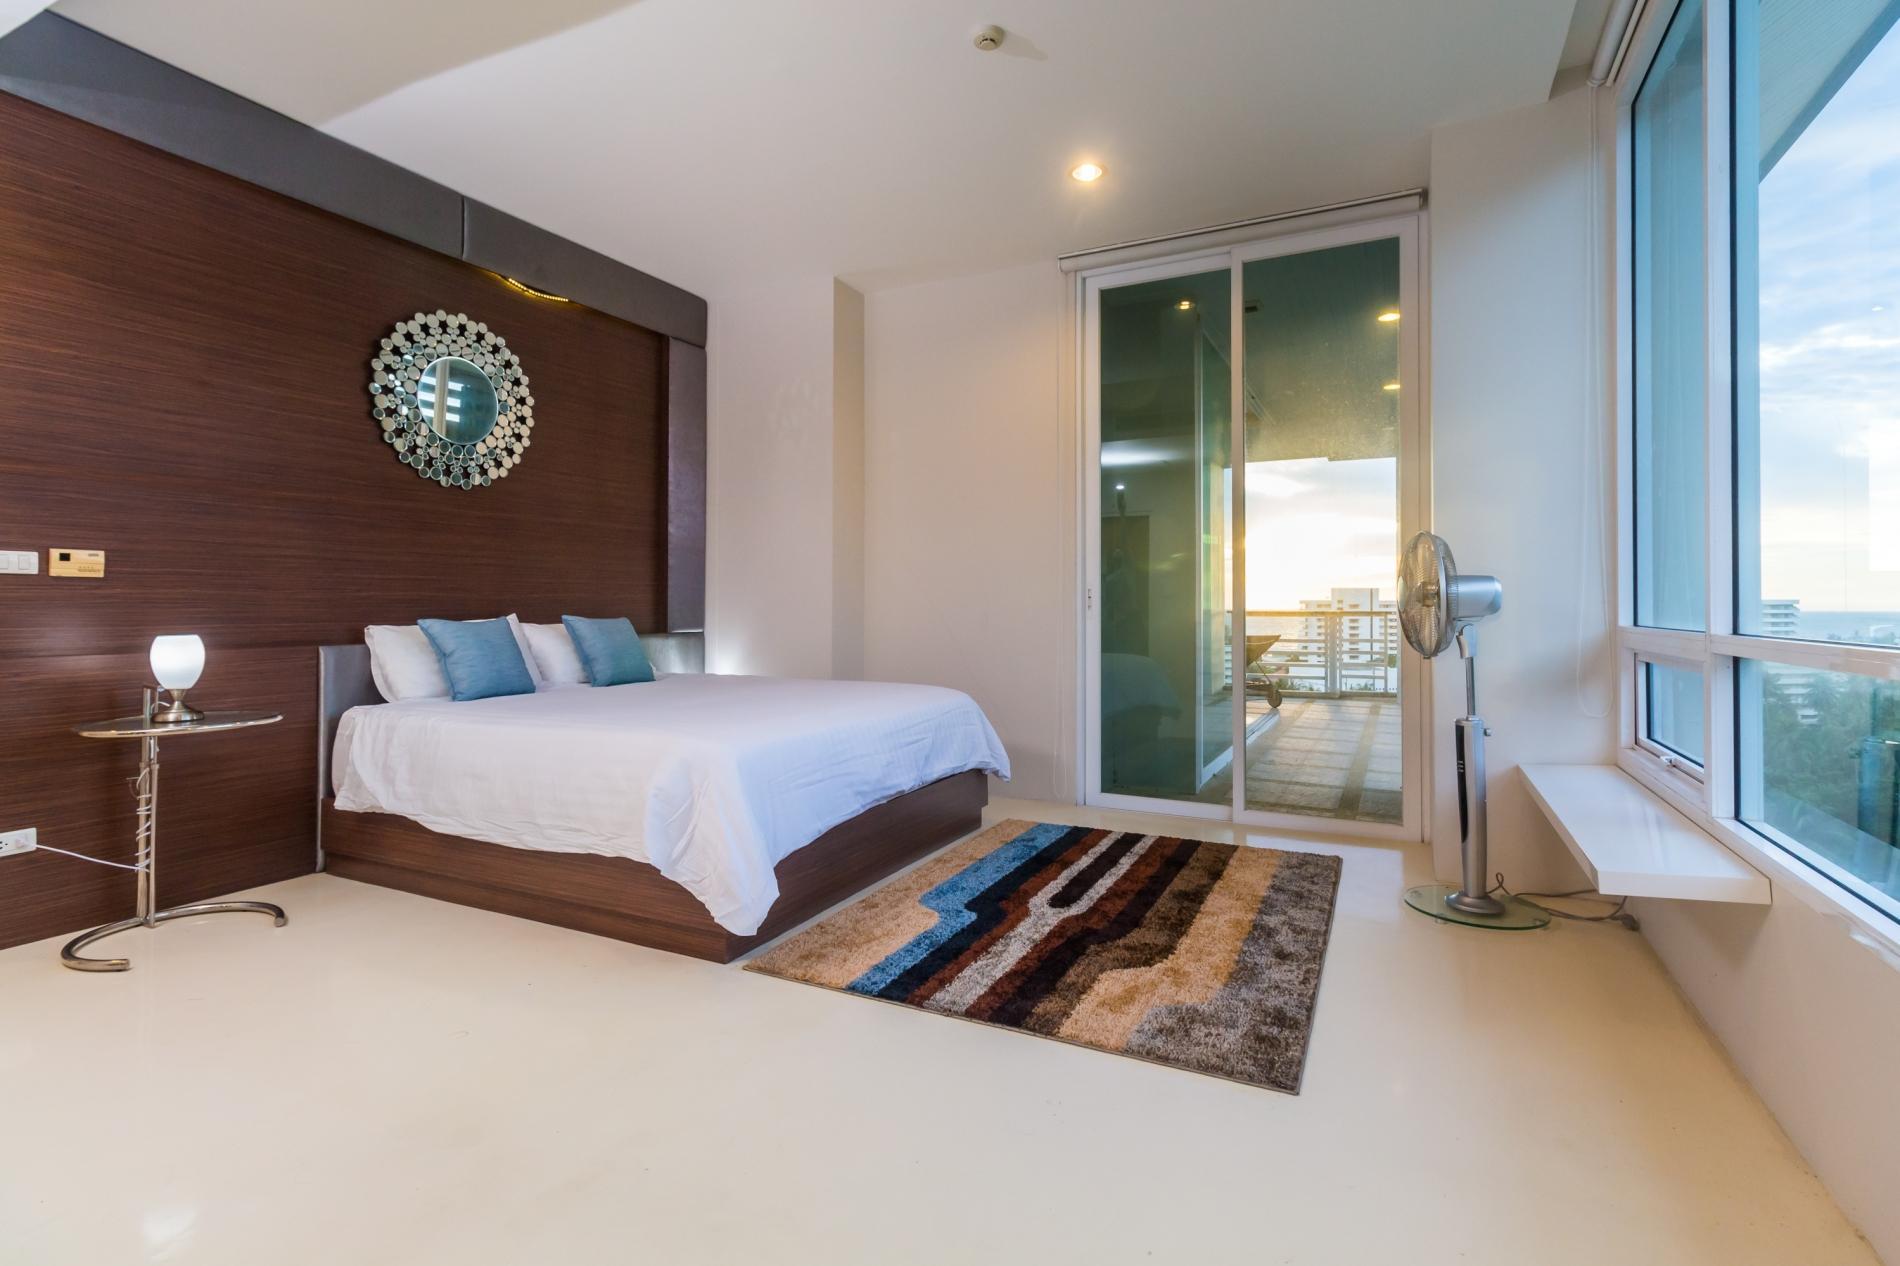 KH2605 - Sea-view Penthouse in Karon, walk to beach, restaurants, bars, shops photo 20390380